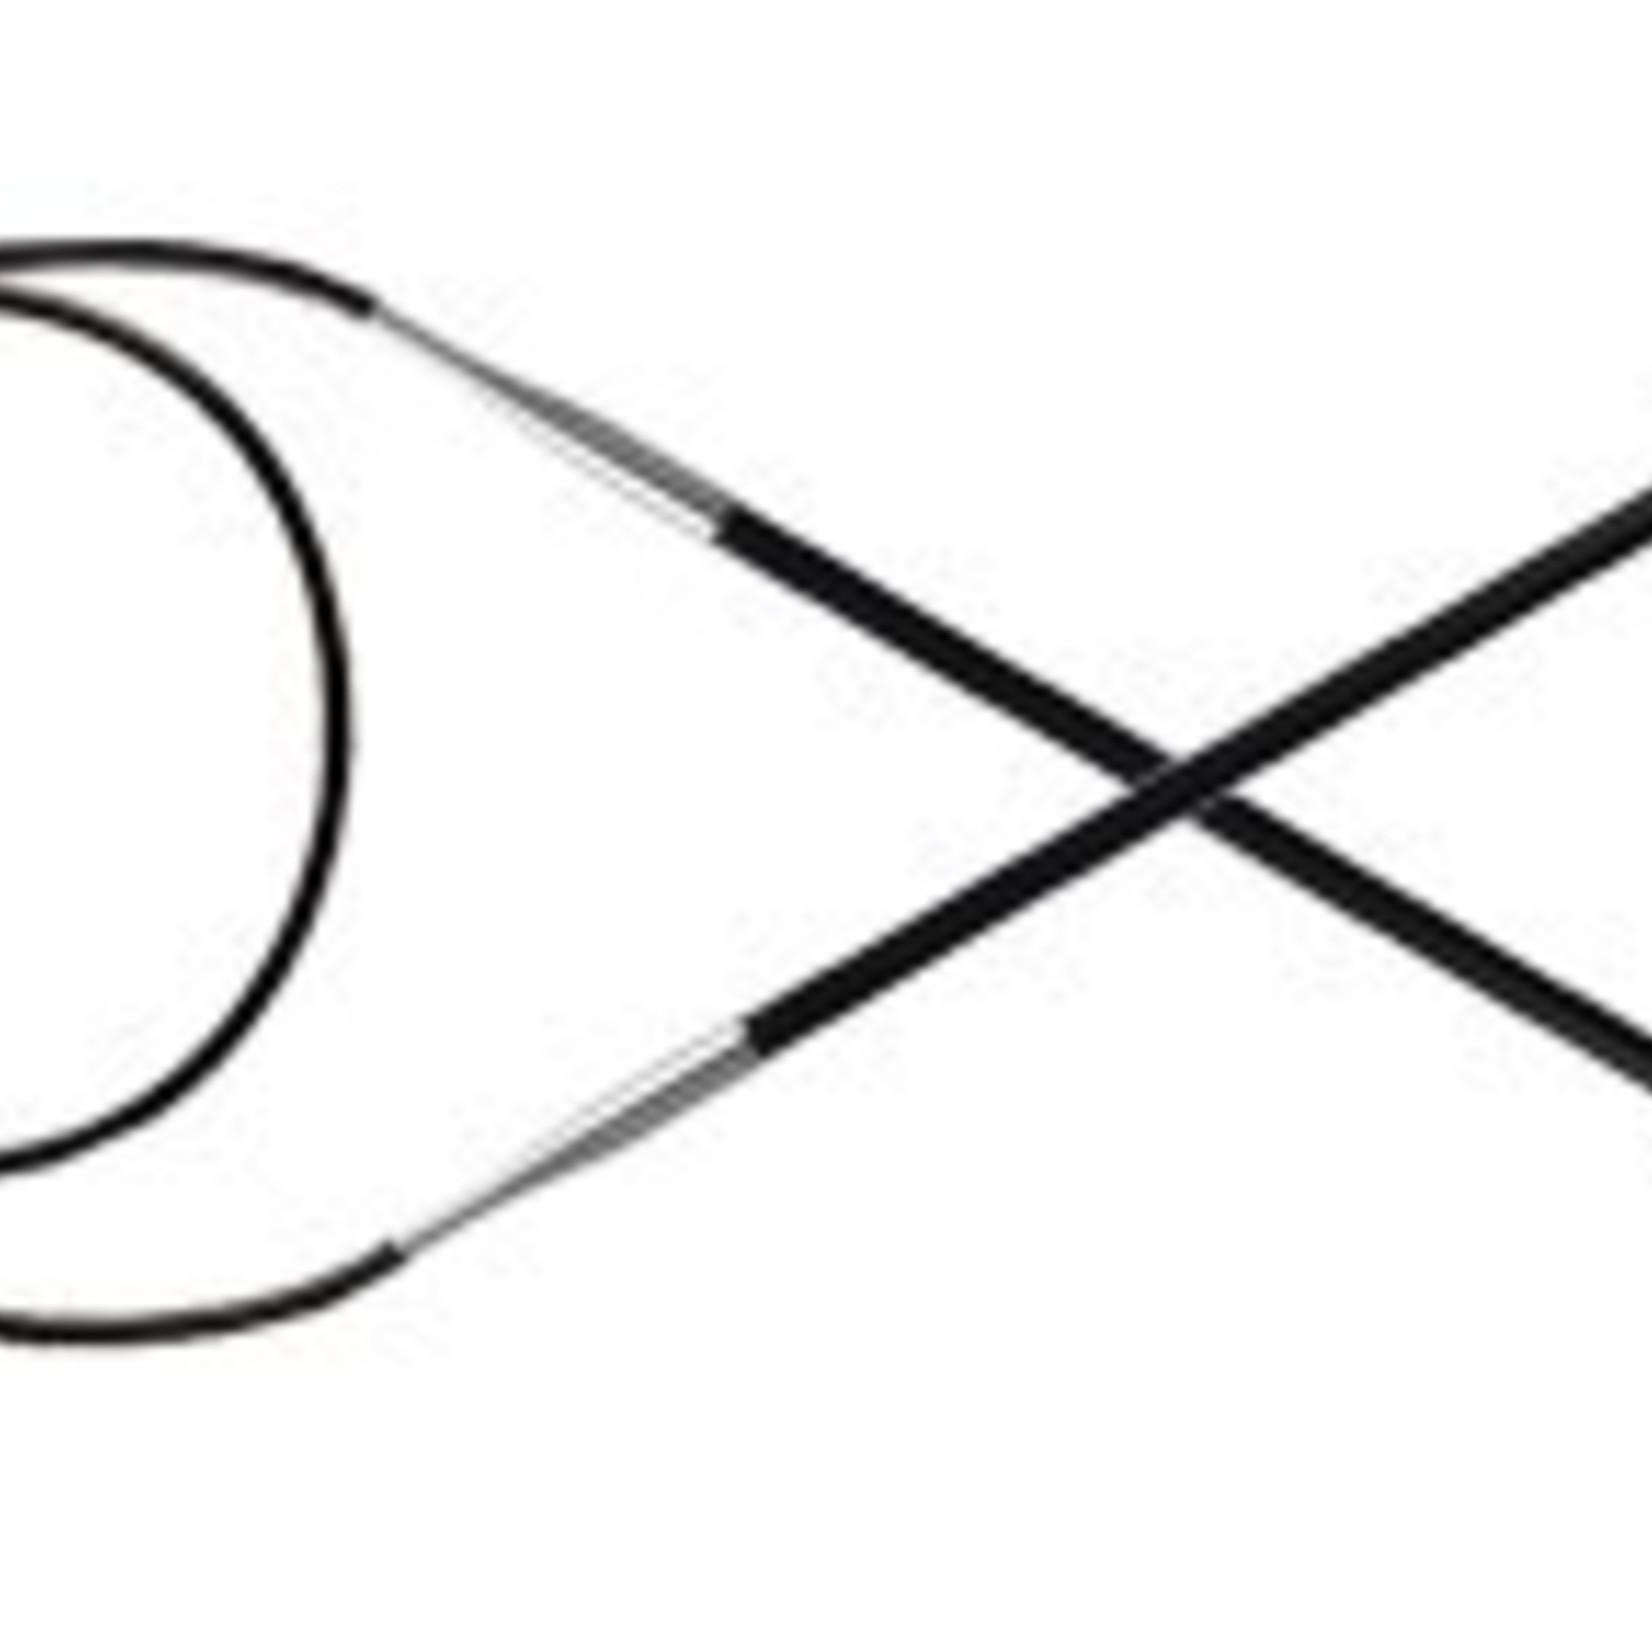 Knitter's Pride 10 Karbonz Circular 24